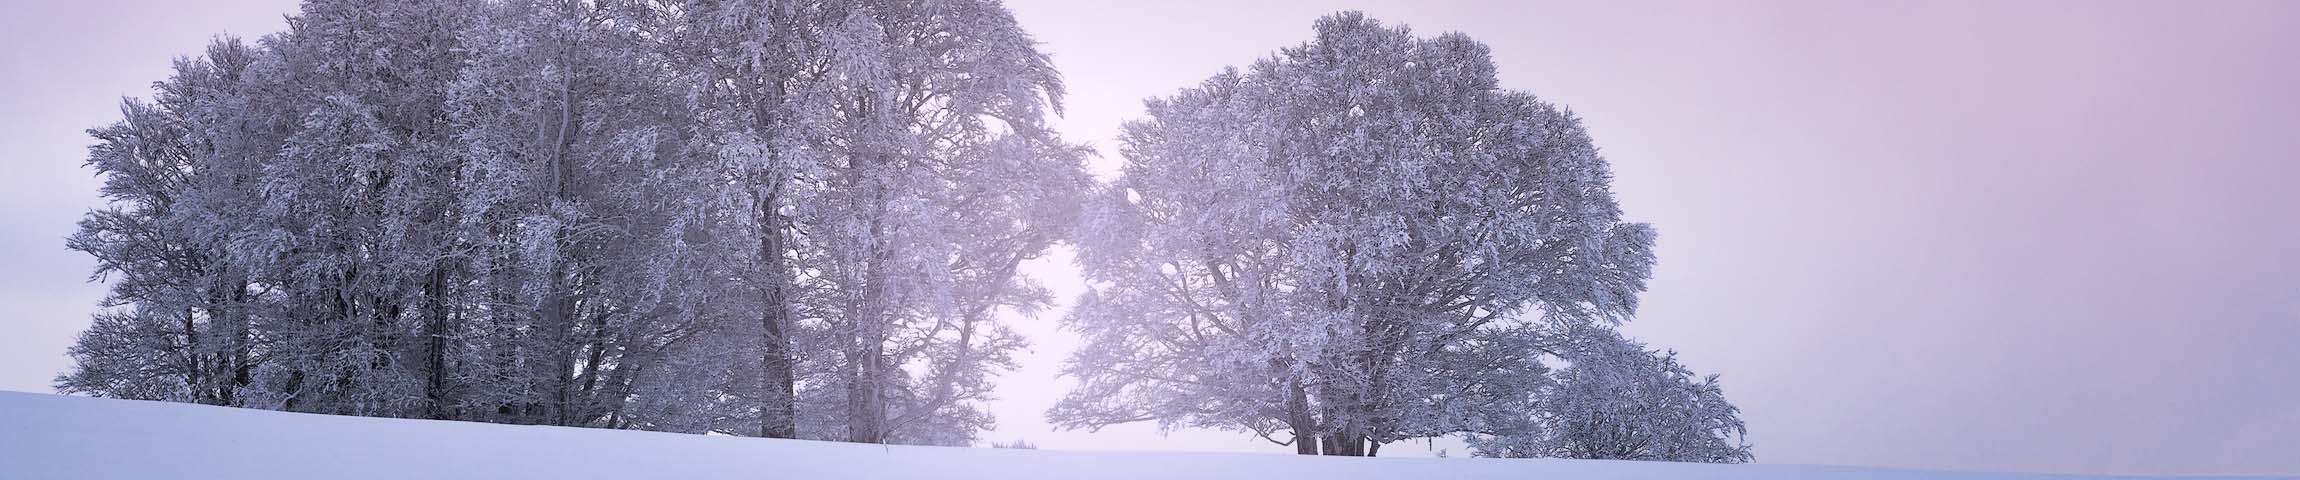 Light in the tree (Creux du Van - Suisse)